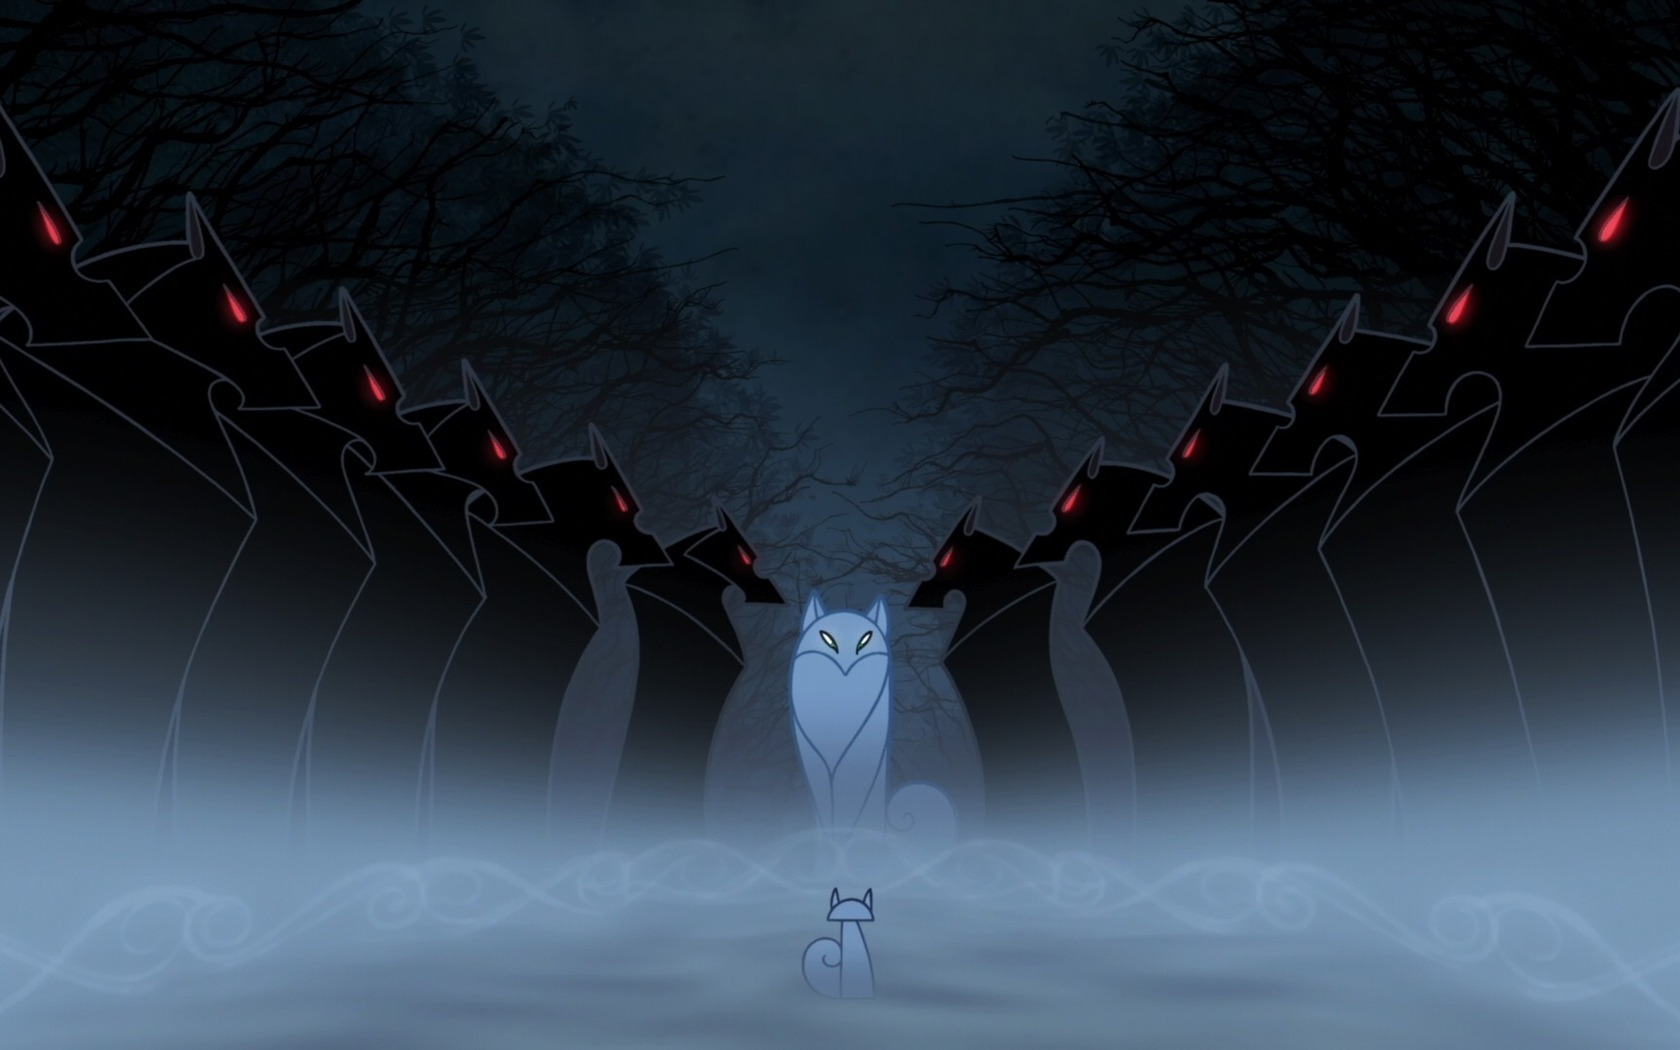 Тайна келлс фентези волки туман